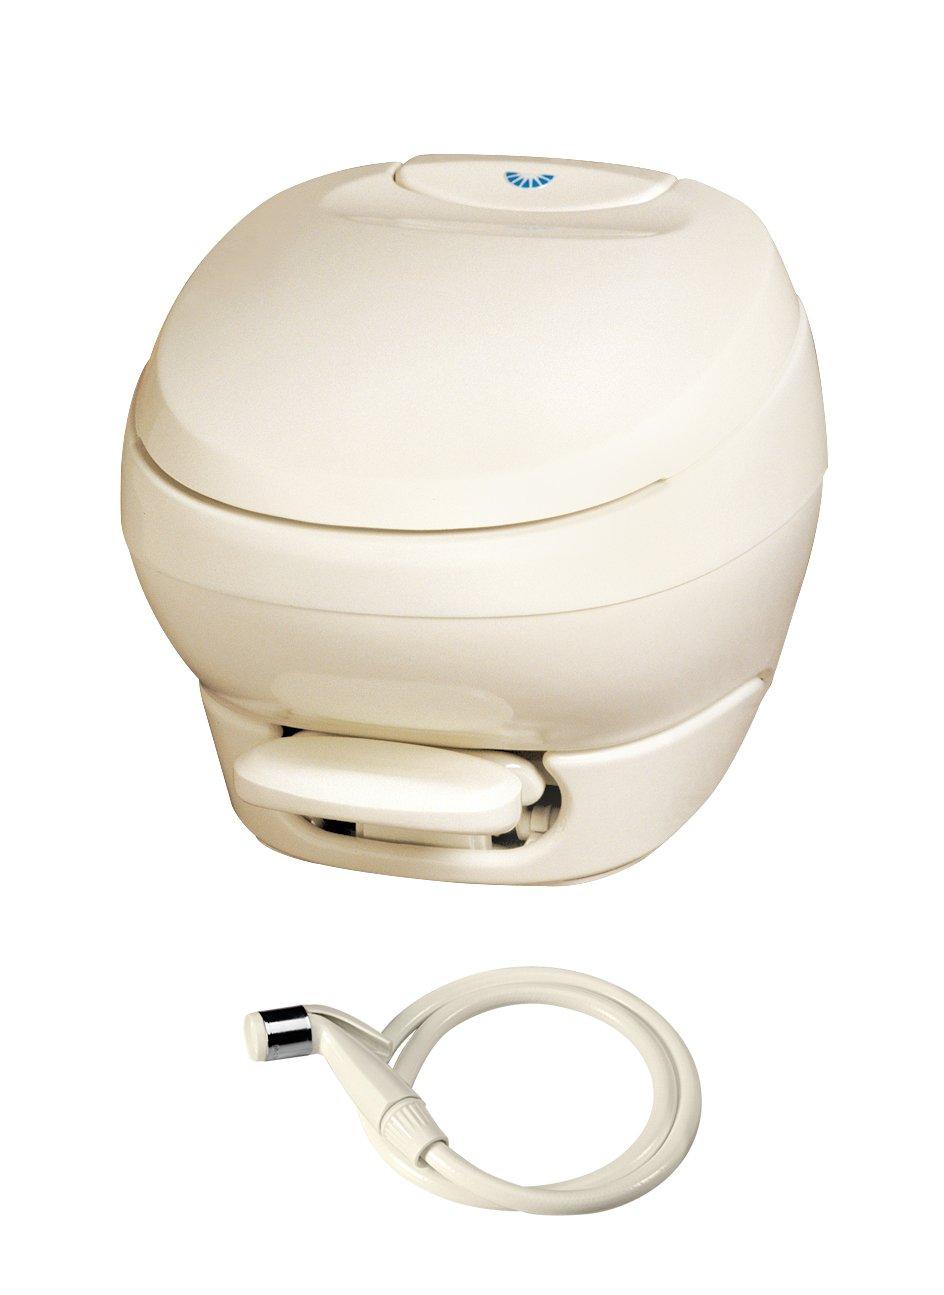 Aqua-Magic Bravura RV Toilet Pedal Flush with Water Saver / Low Profile / Parchment - Thetford 31121 by Thetford